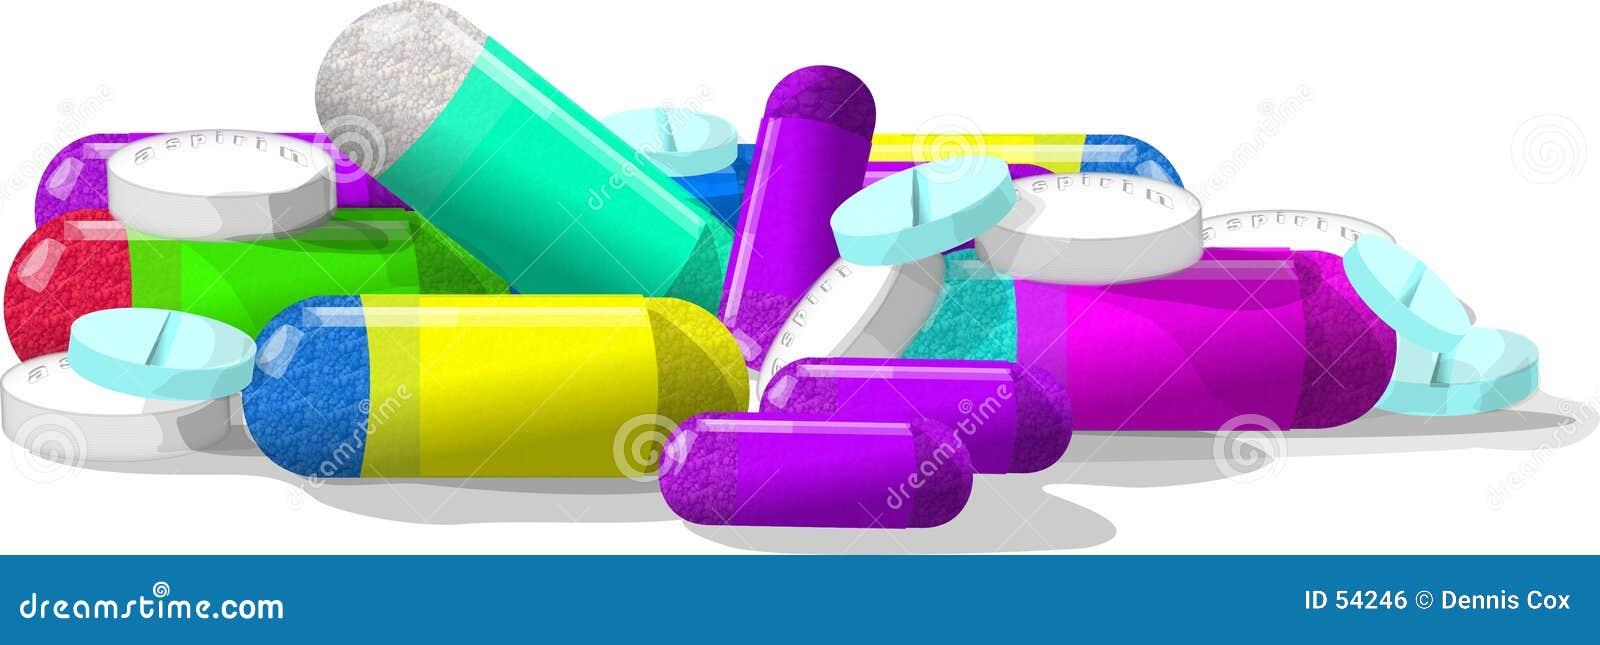 Comprimidos, comprimidos & mais comprimidos